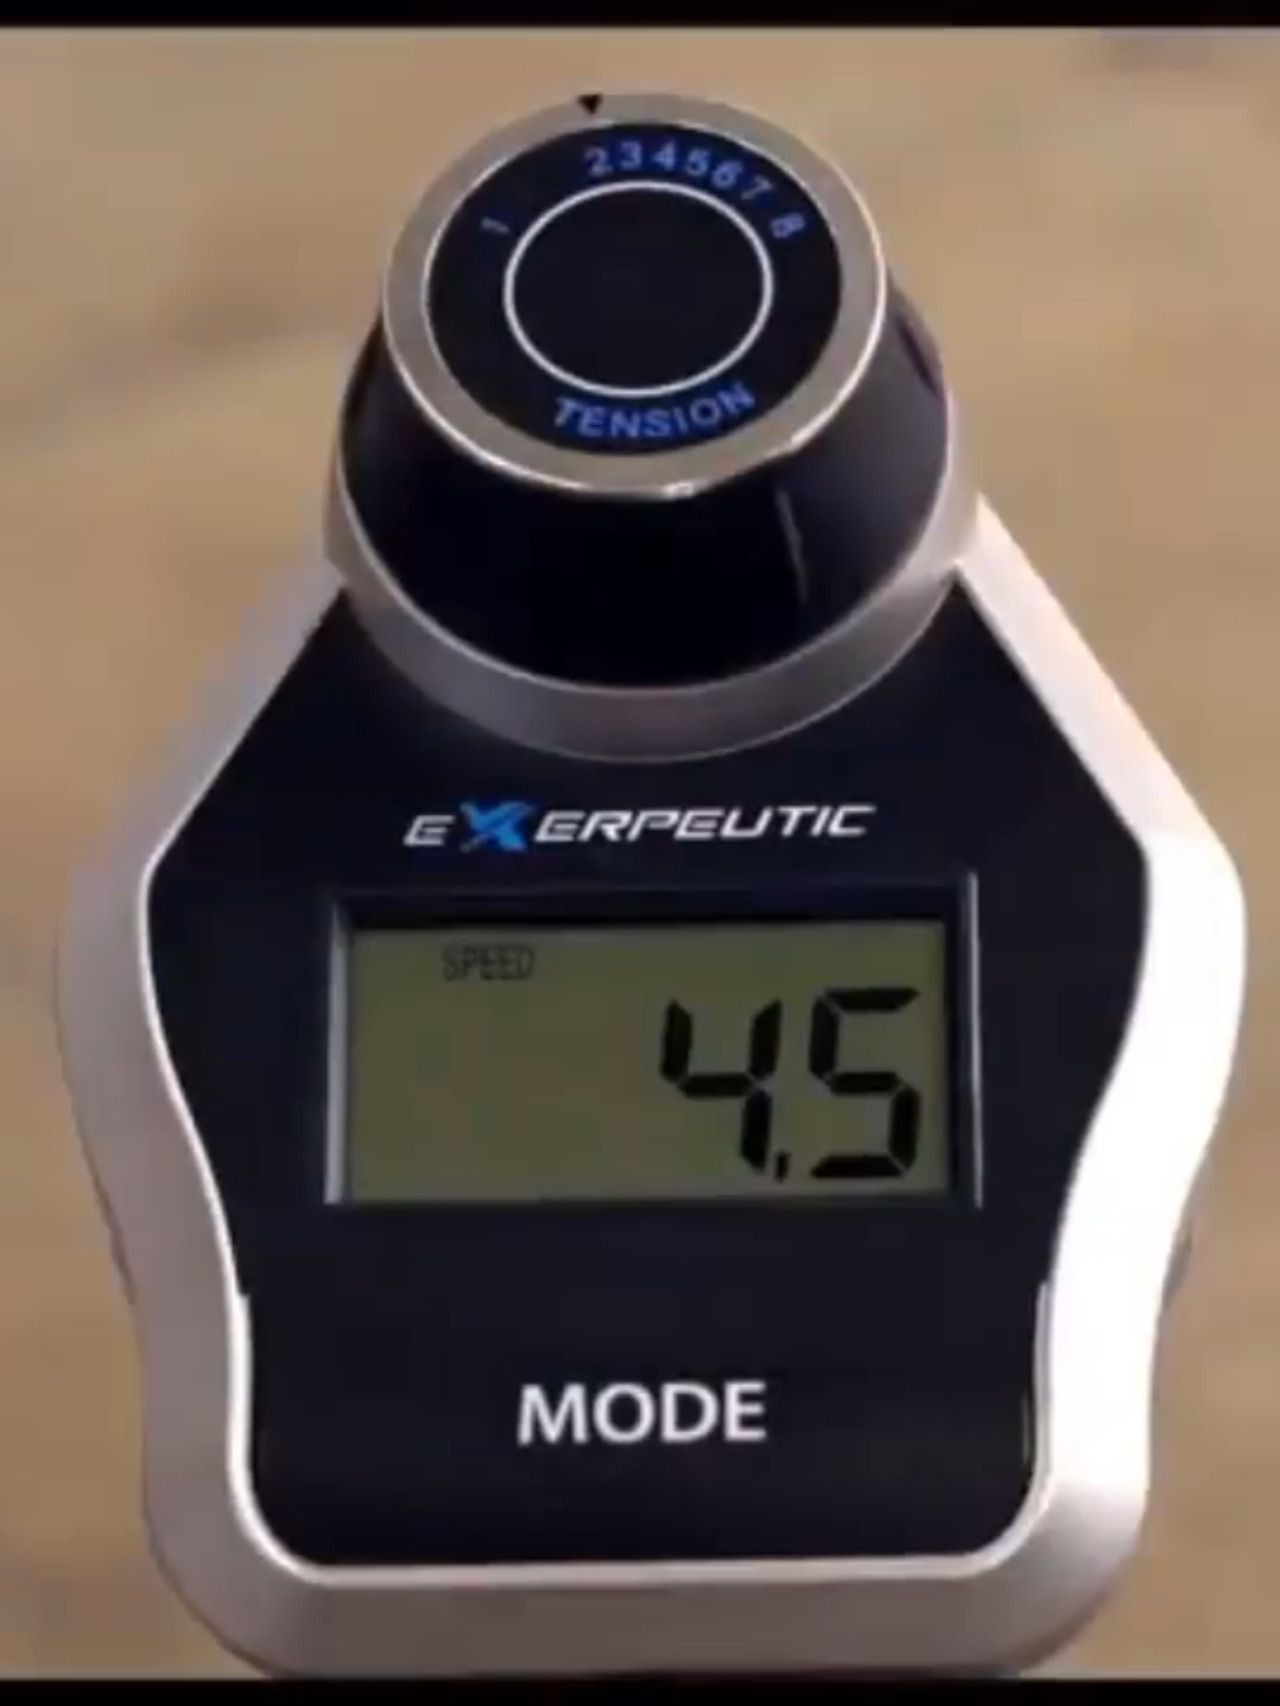 Body Cycle Elliptical Vs Treadmill Reddit Fold Up Exercise Bike